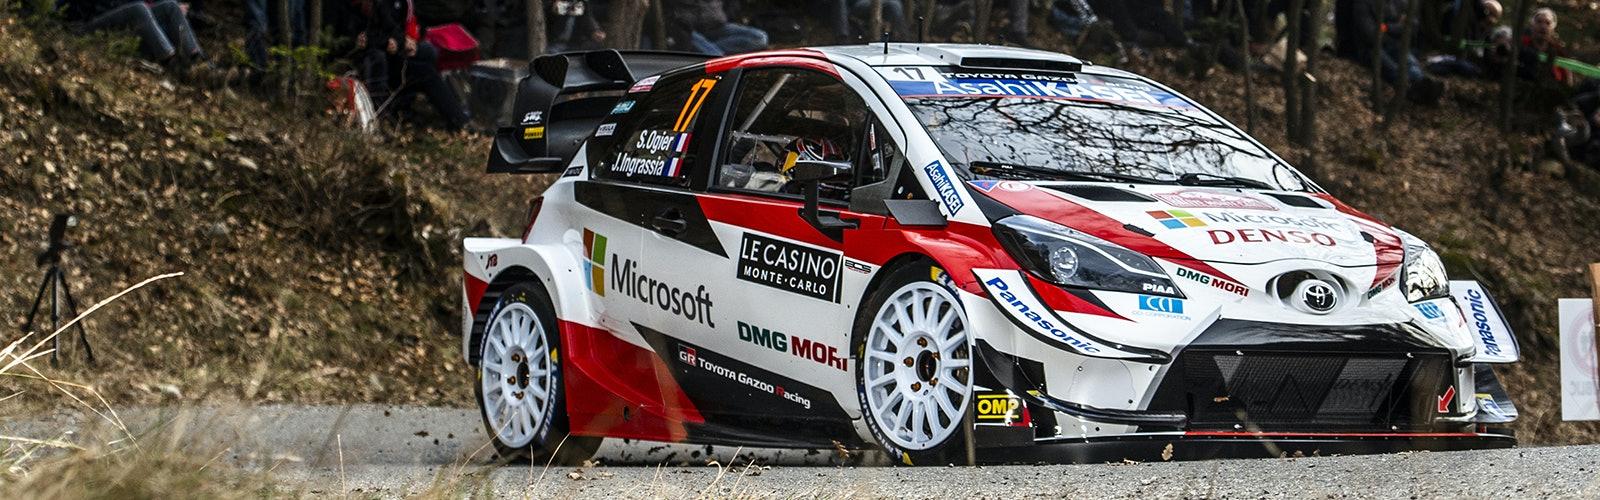 Sebastien Ogier Toyota WRC Monte Carlo Rally 2020